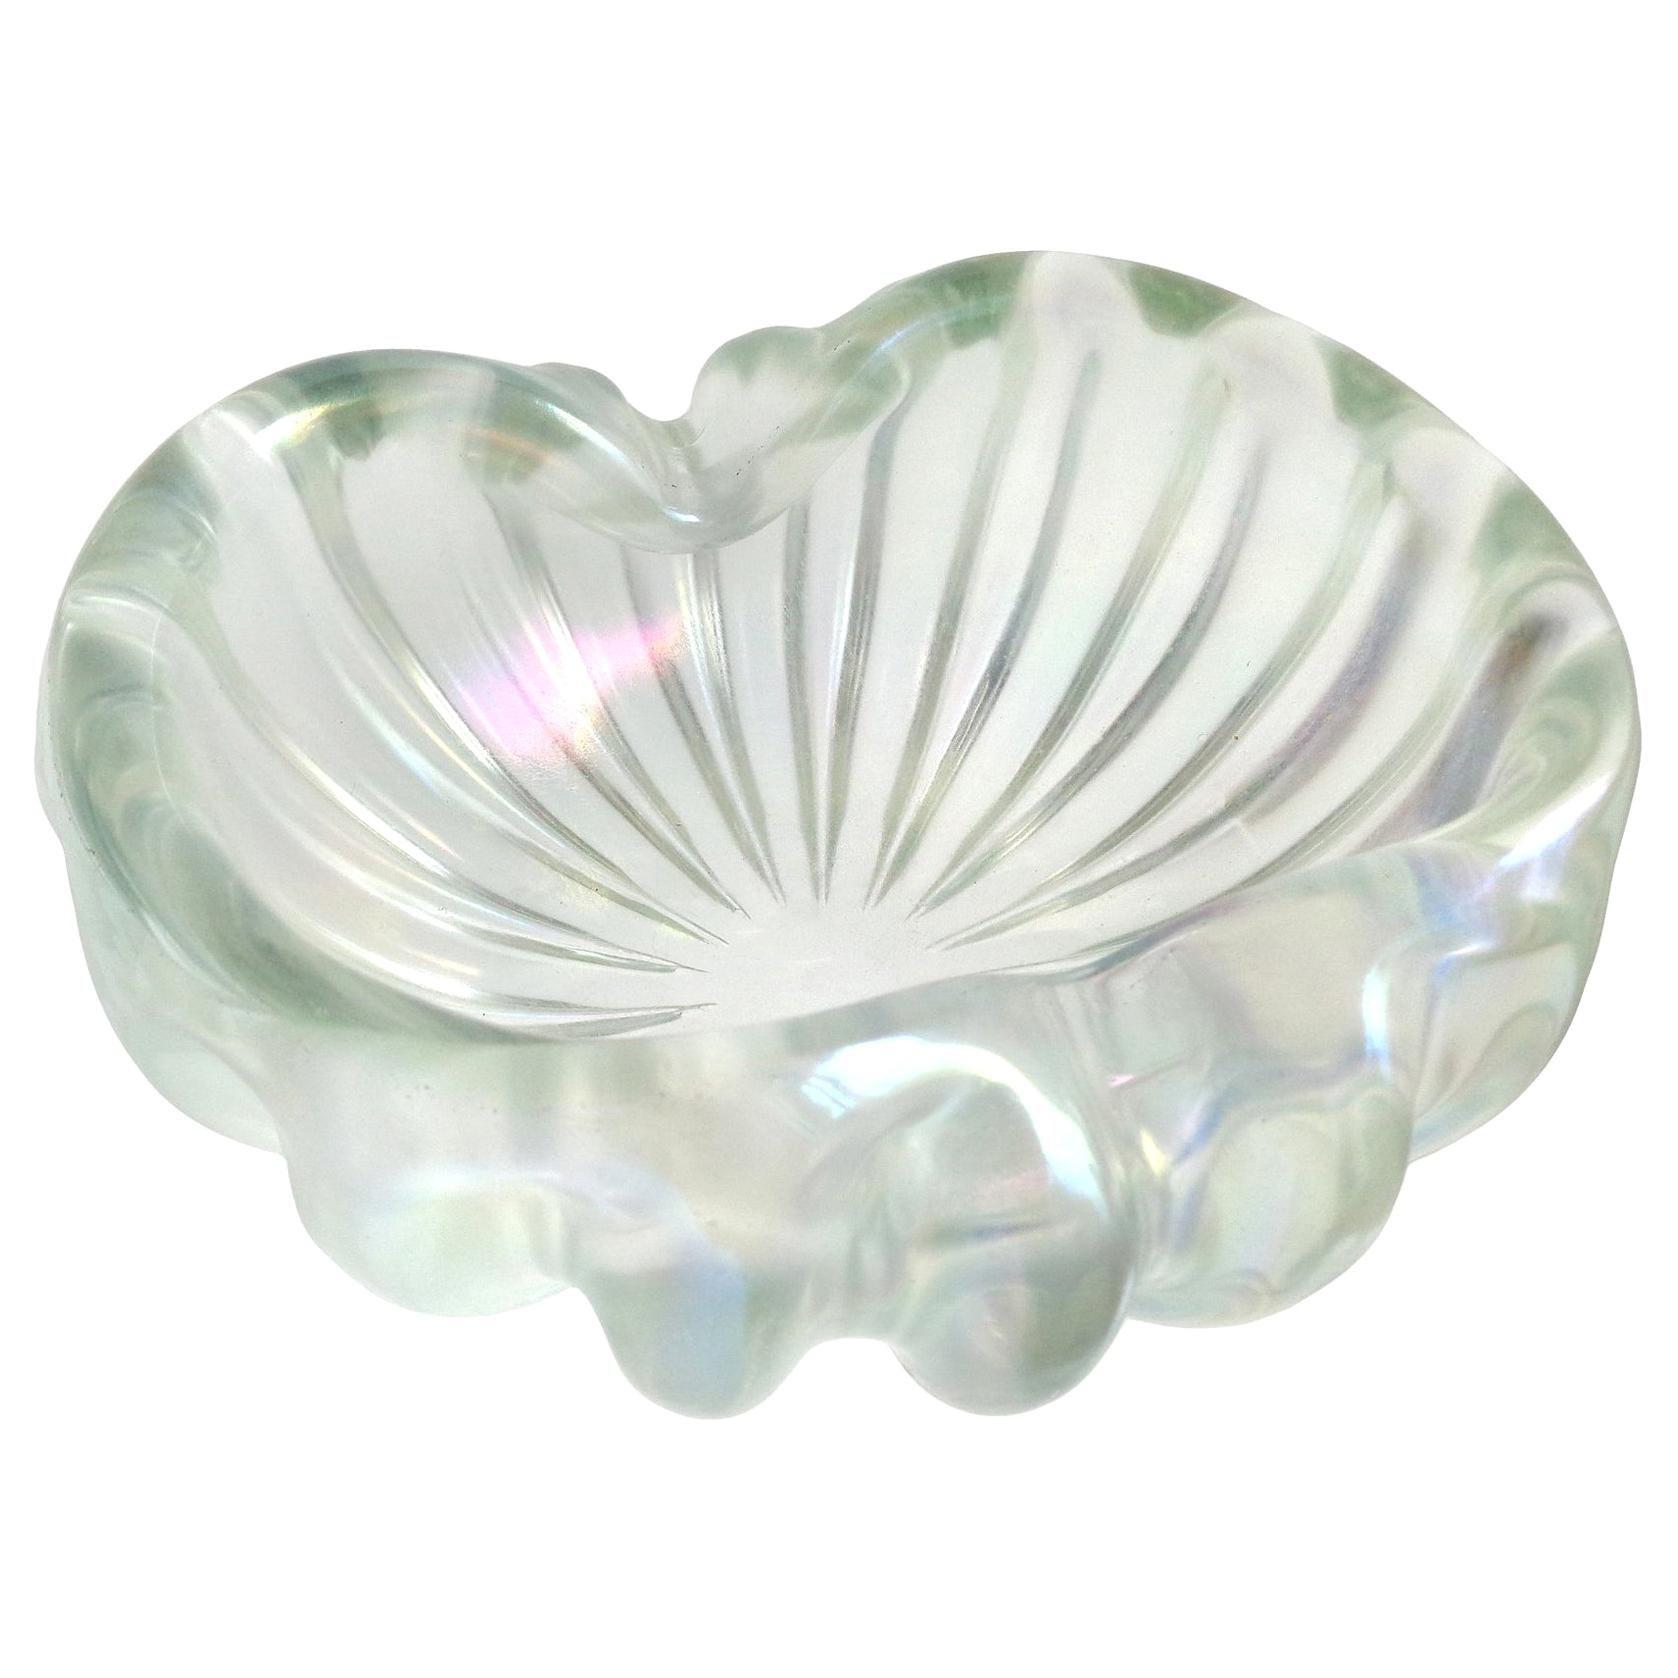 Barovier Toso Murano Clear Iridescent Italian Art Glass Chunky Ribbed Bowl